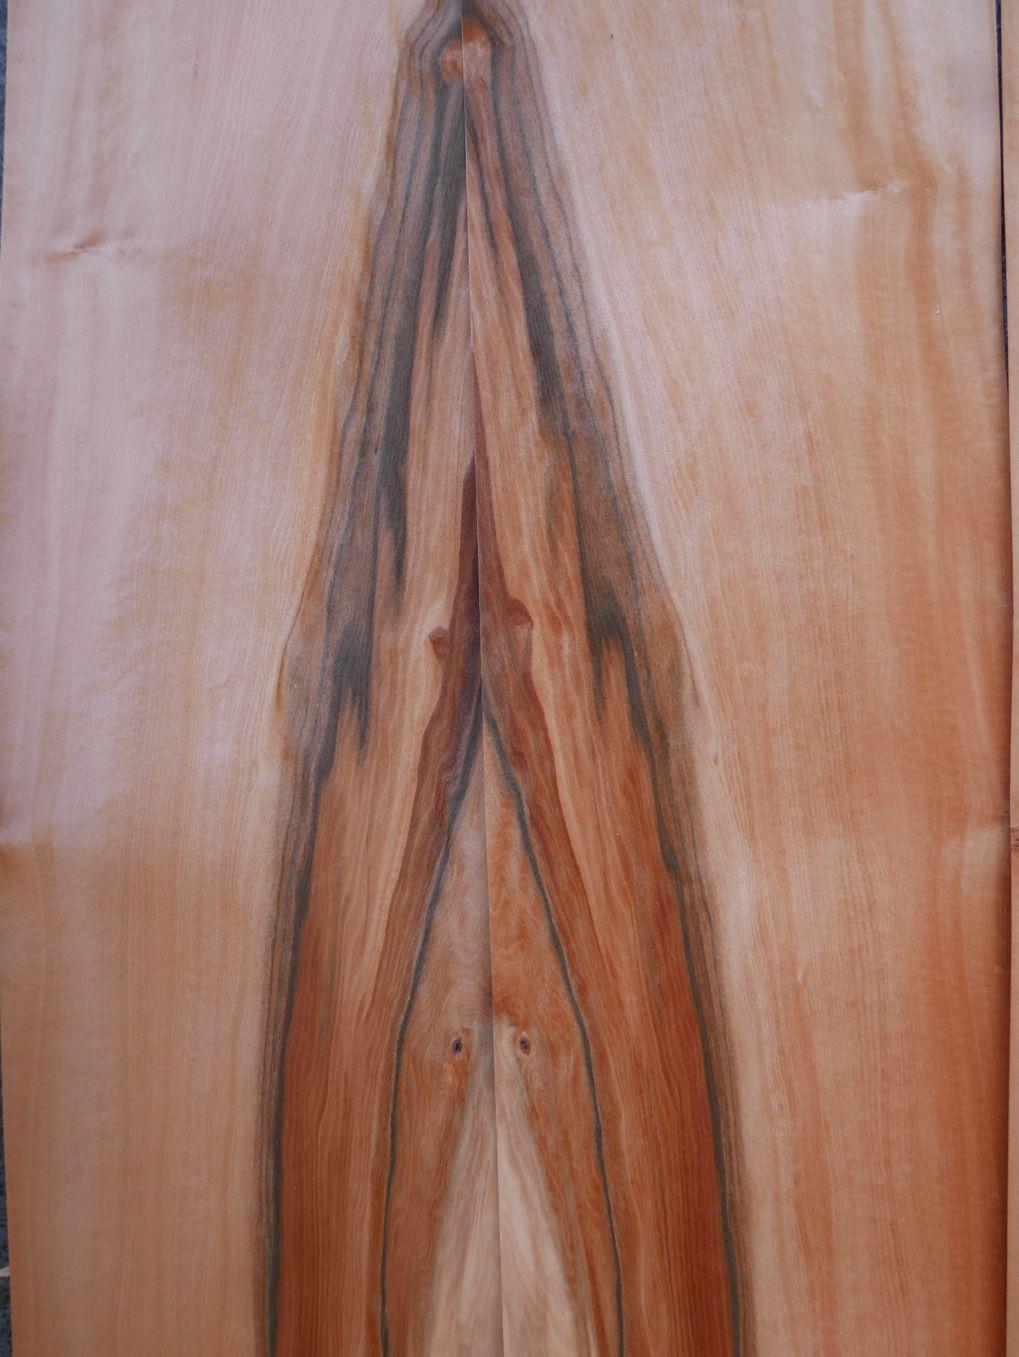 A0322-1 Tineo 14,5-15x152cm 22st